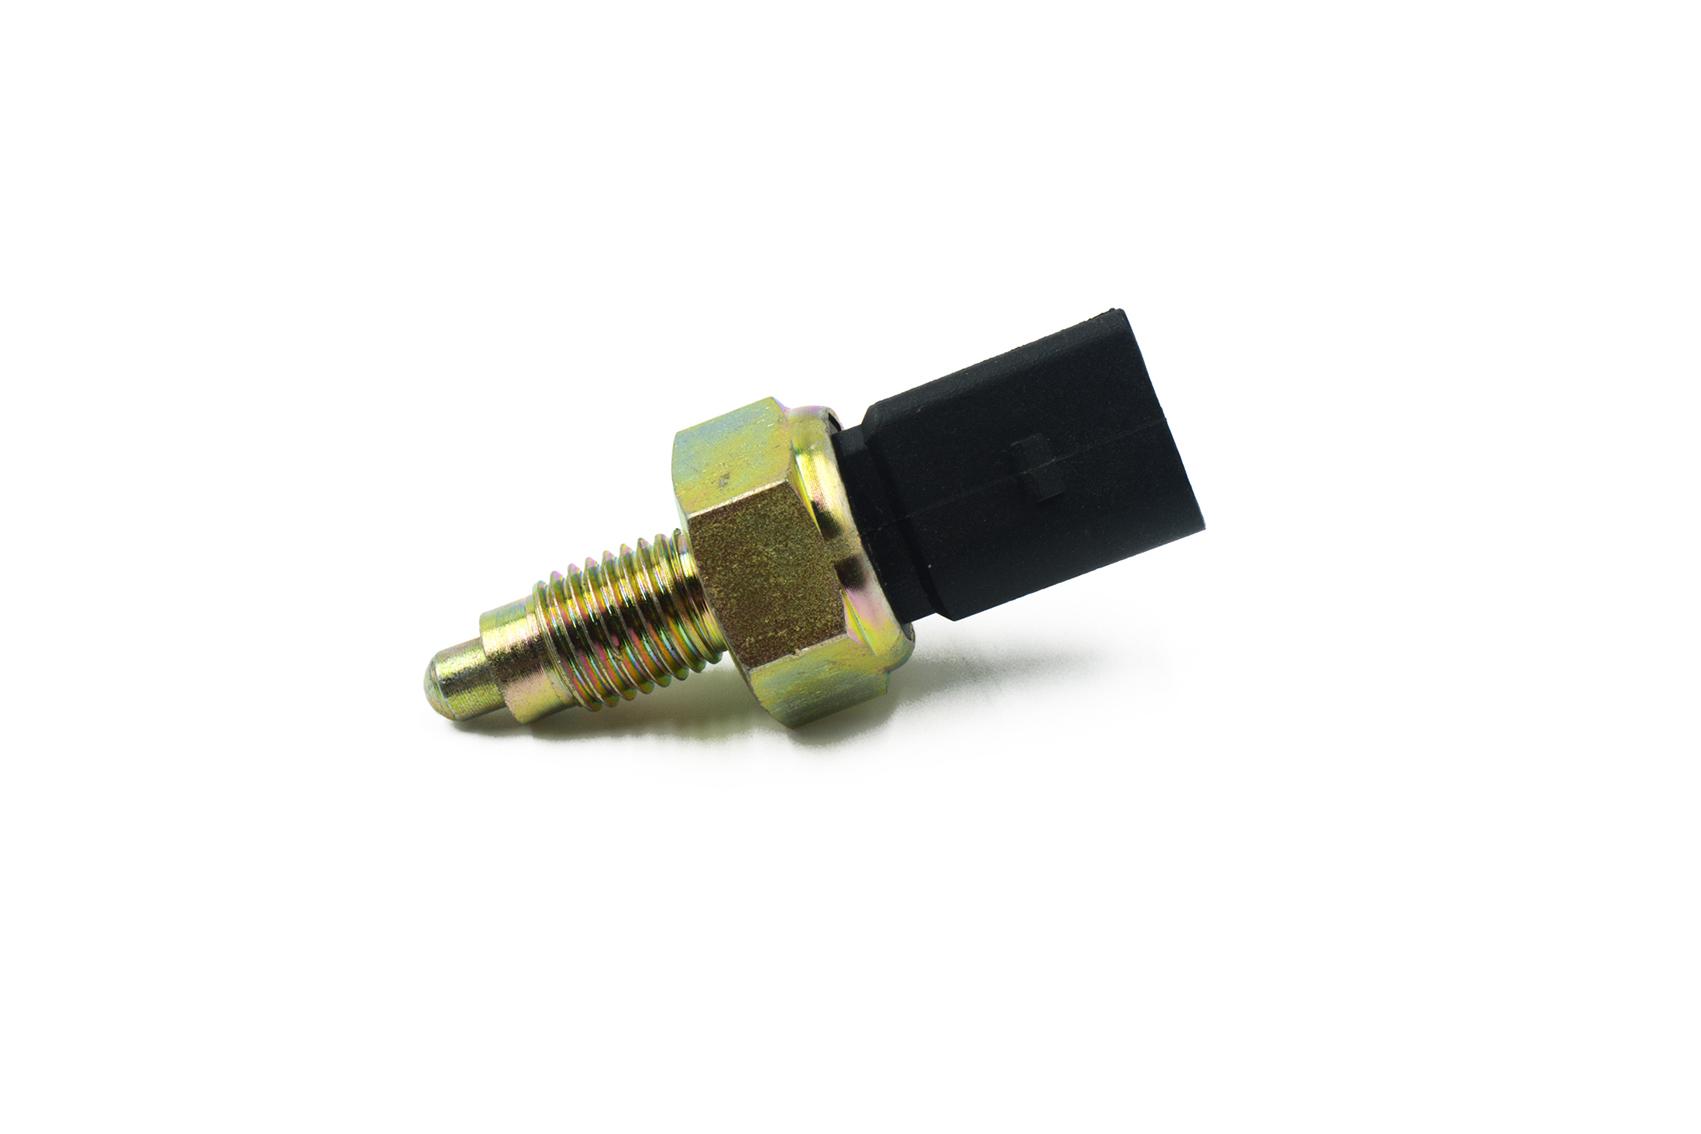 Geri Vites Sensörü Oval Soket  - A1 - A3 - TT - Bora - Caddy 2,3 - Golf4 , 5 - Jetta - Lupo - Passat - Sharan - Tiguan - Transpo